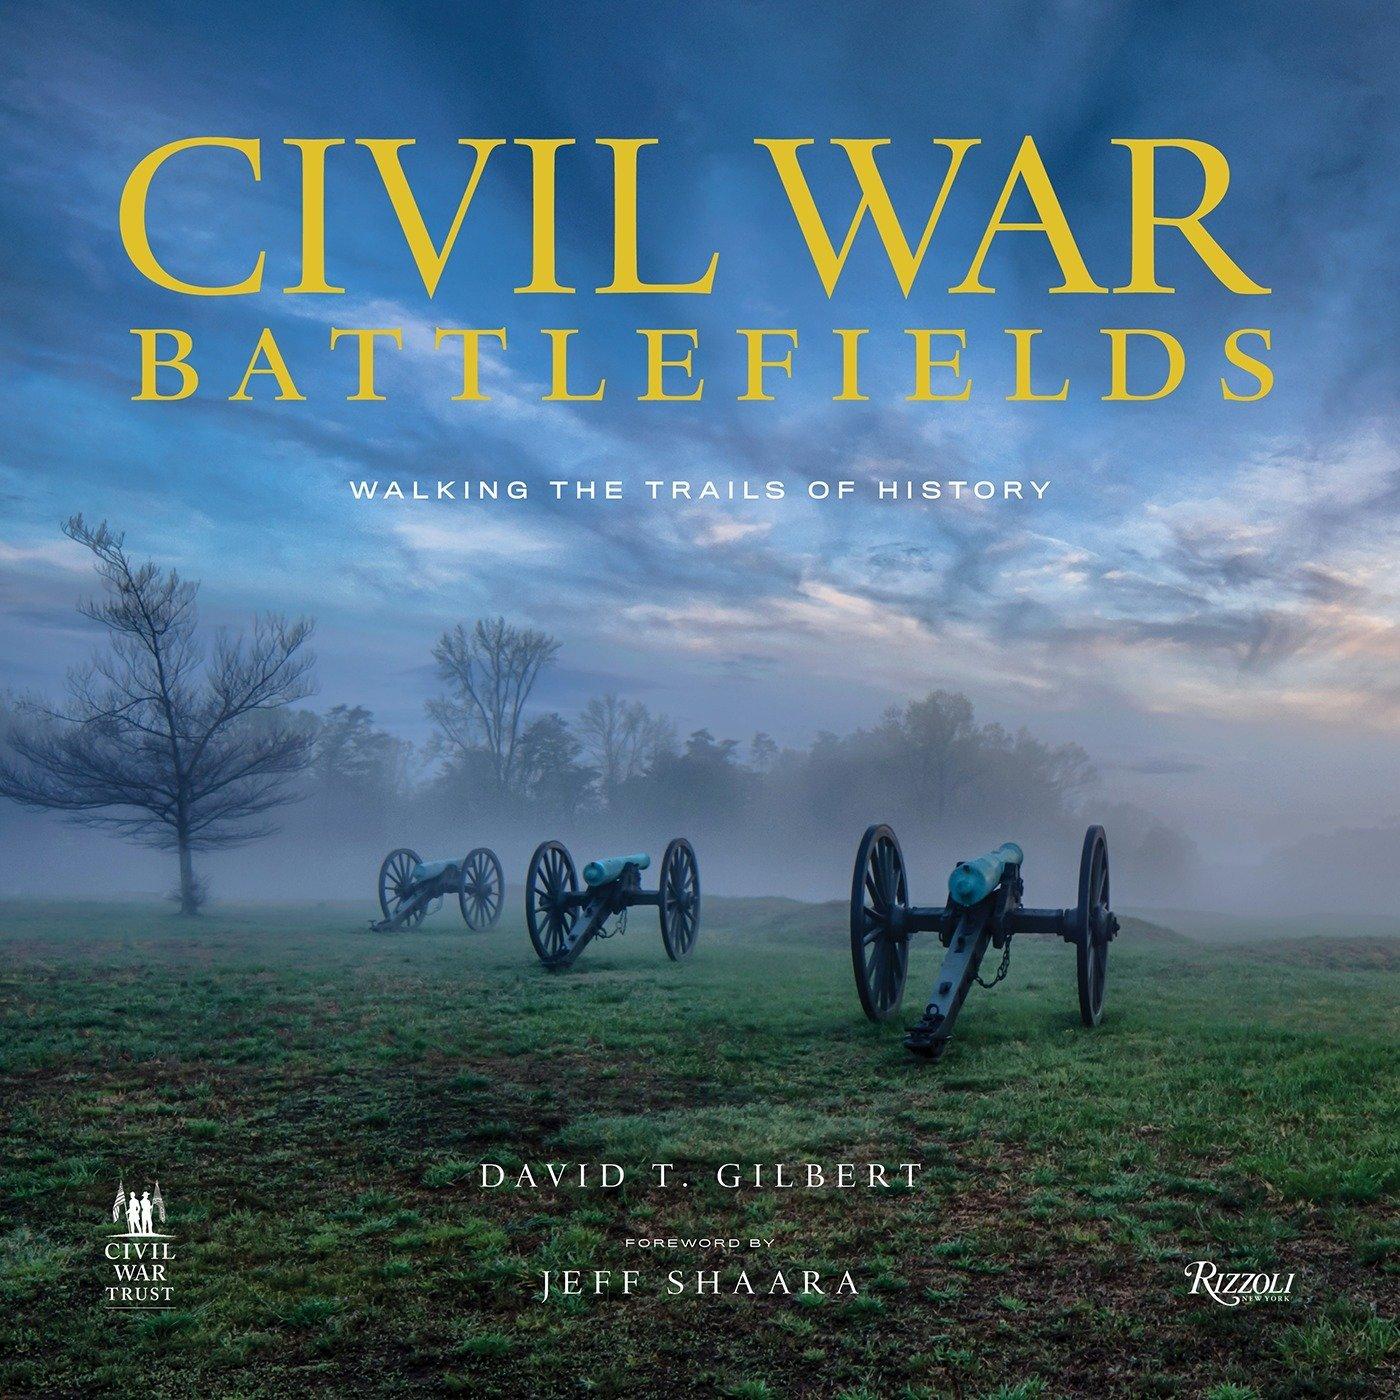 Civil War Battlefields: Walking the Trails of